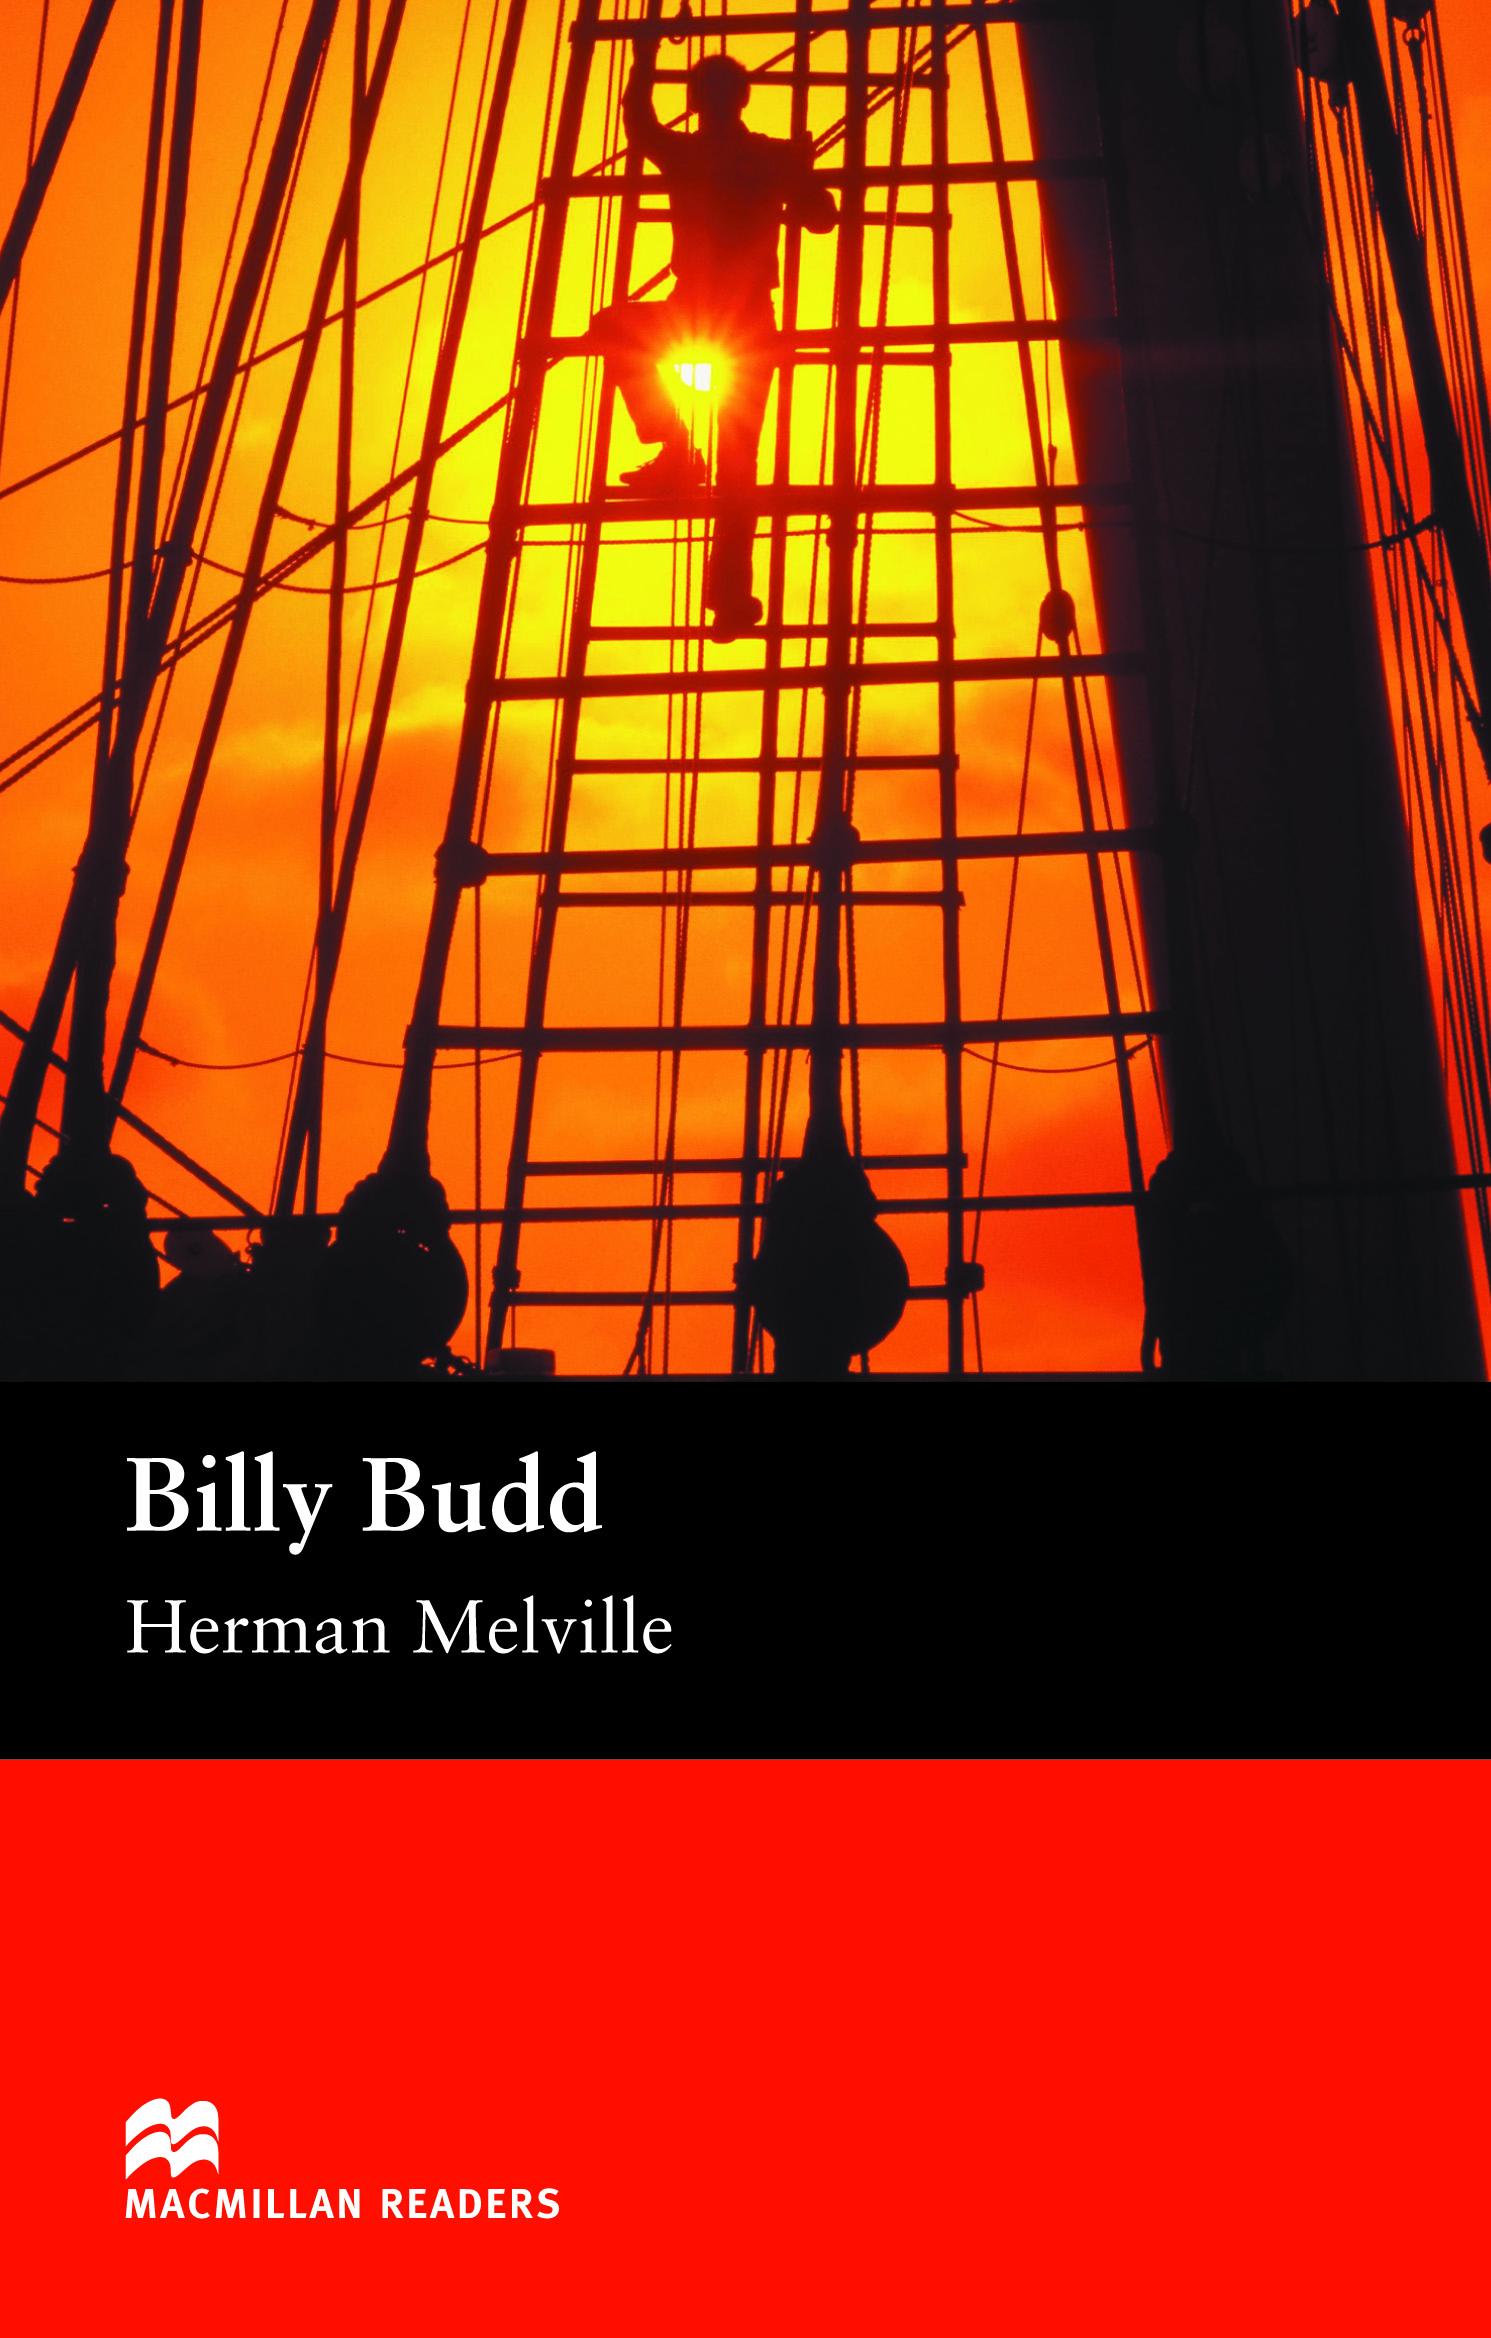 Macmillan Readers: Billy Budd